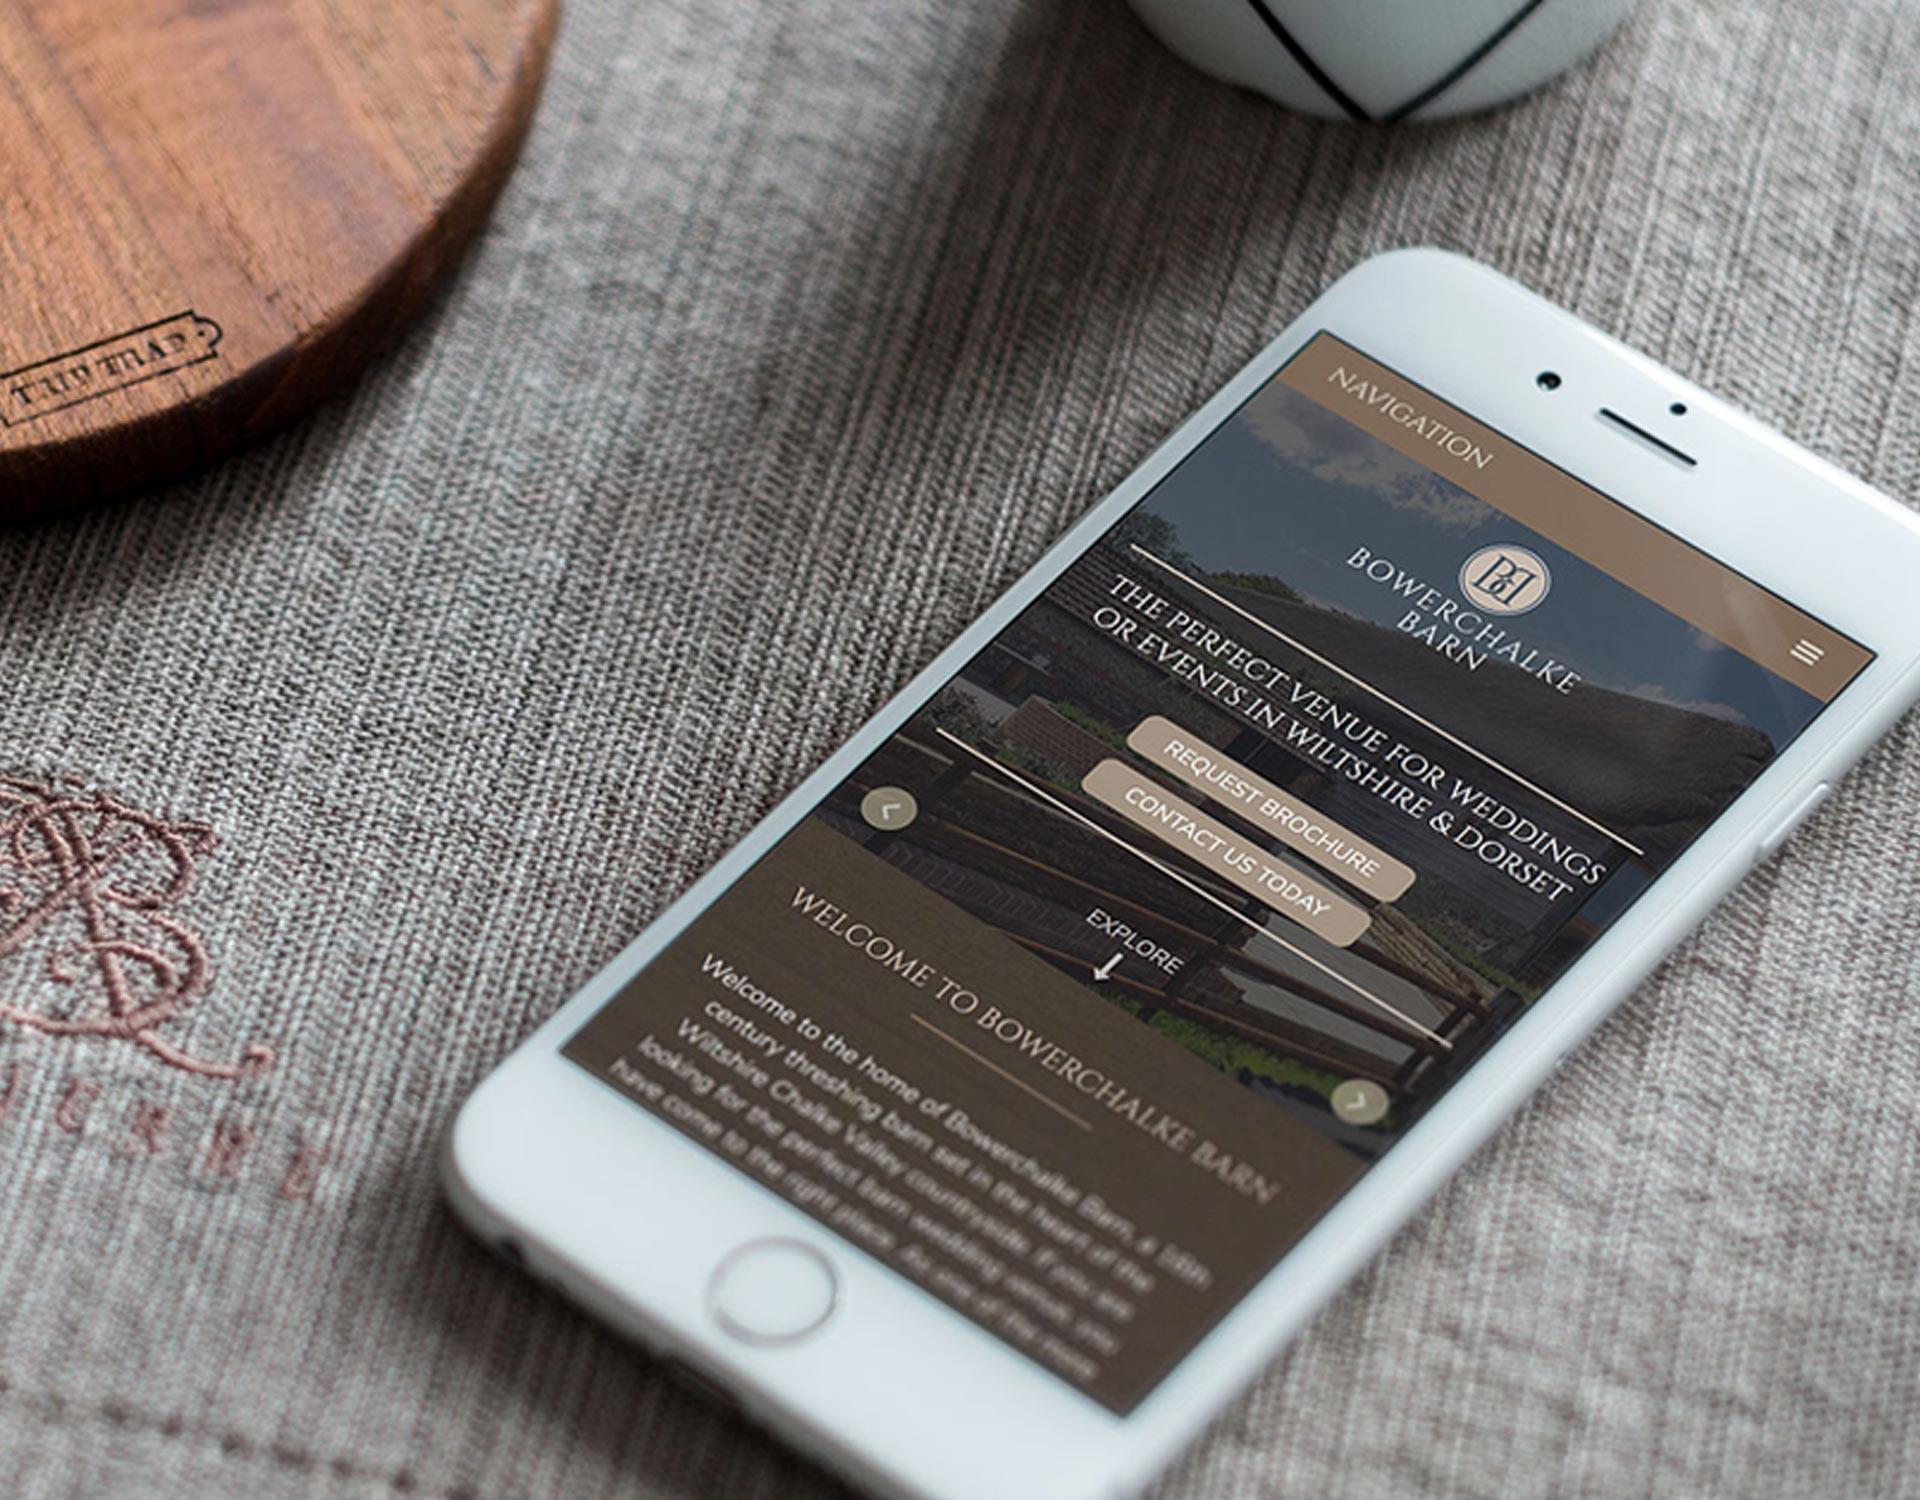 Bowerchalke Barn website on a mobile device